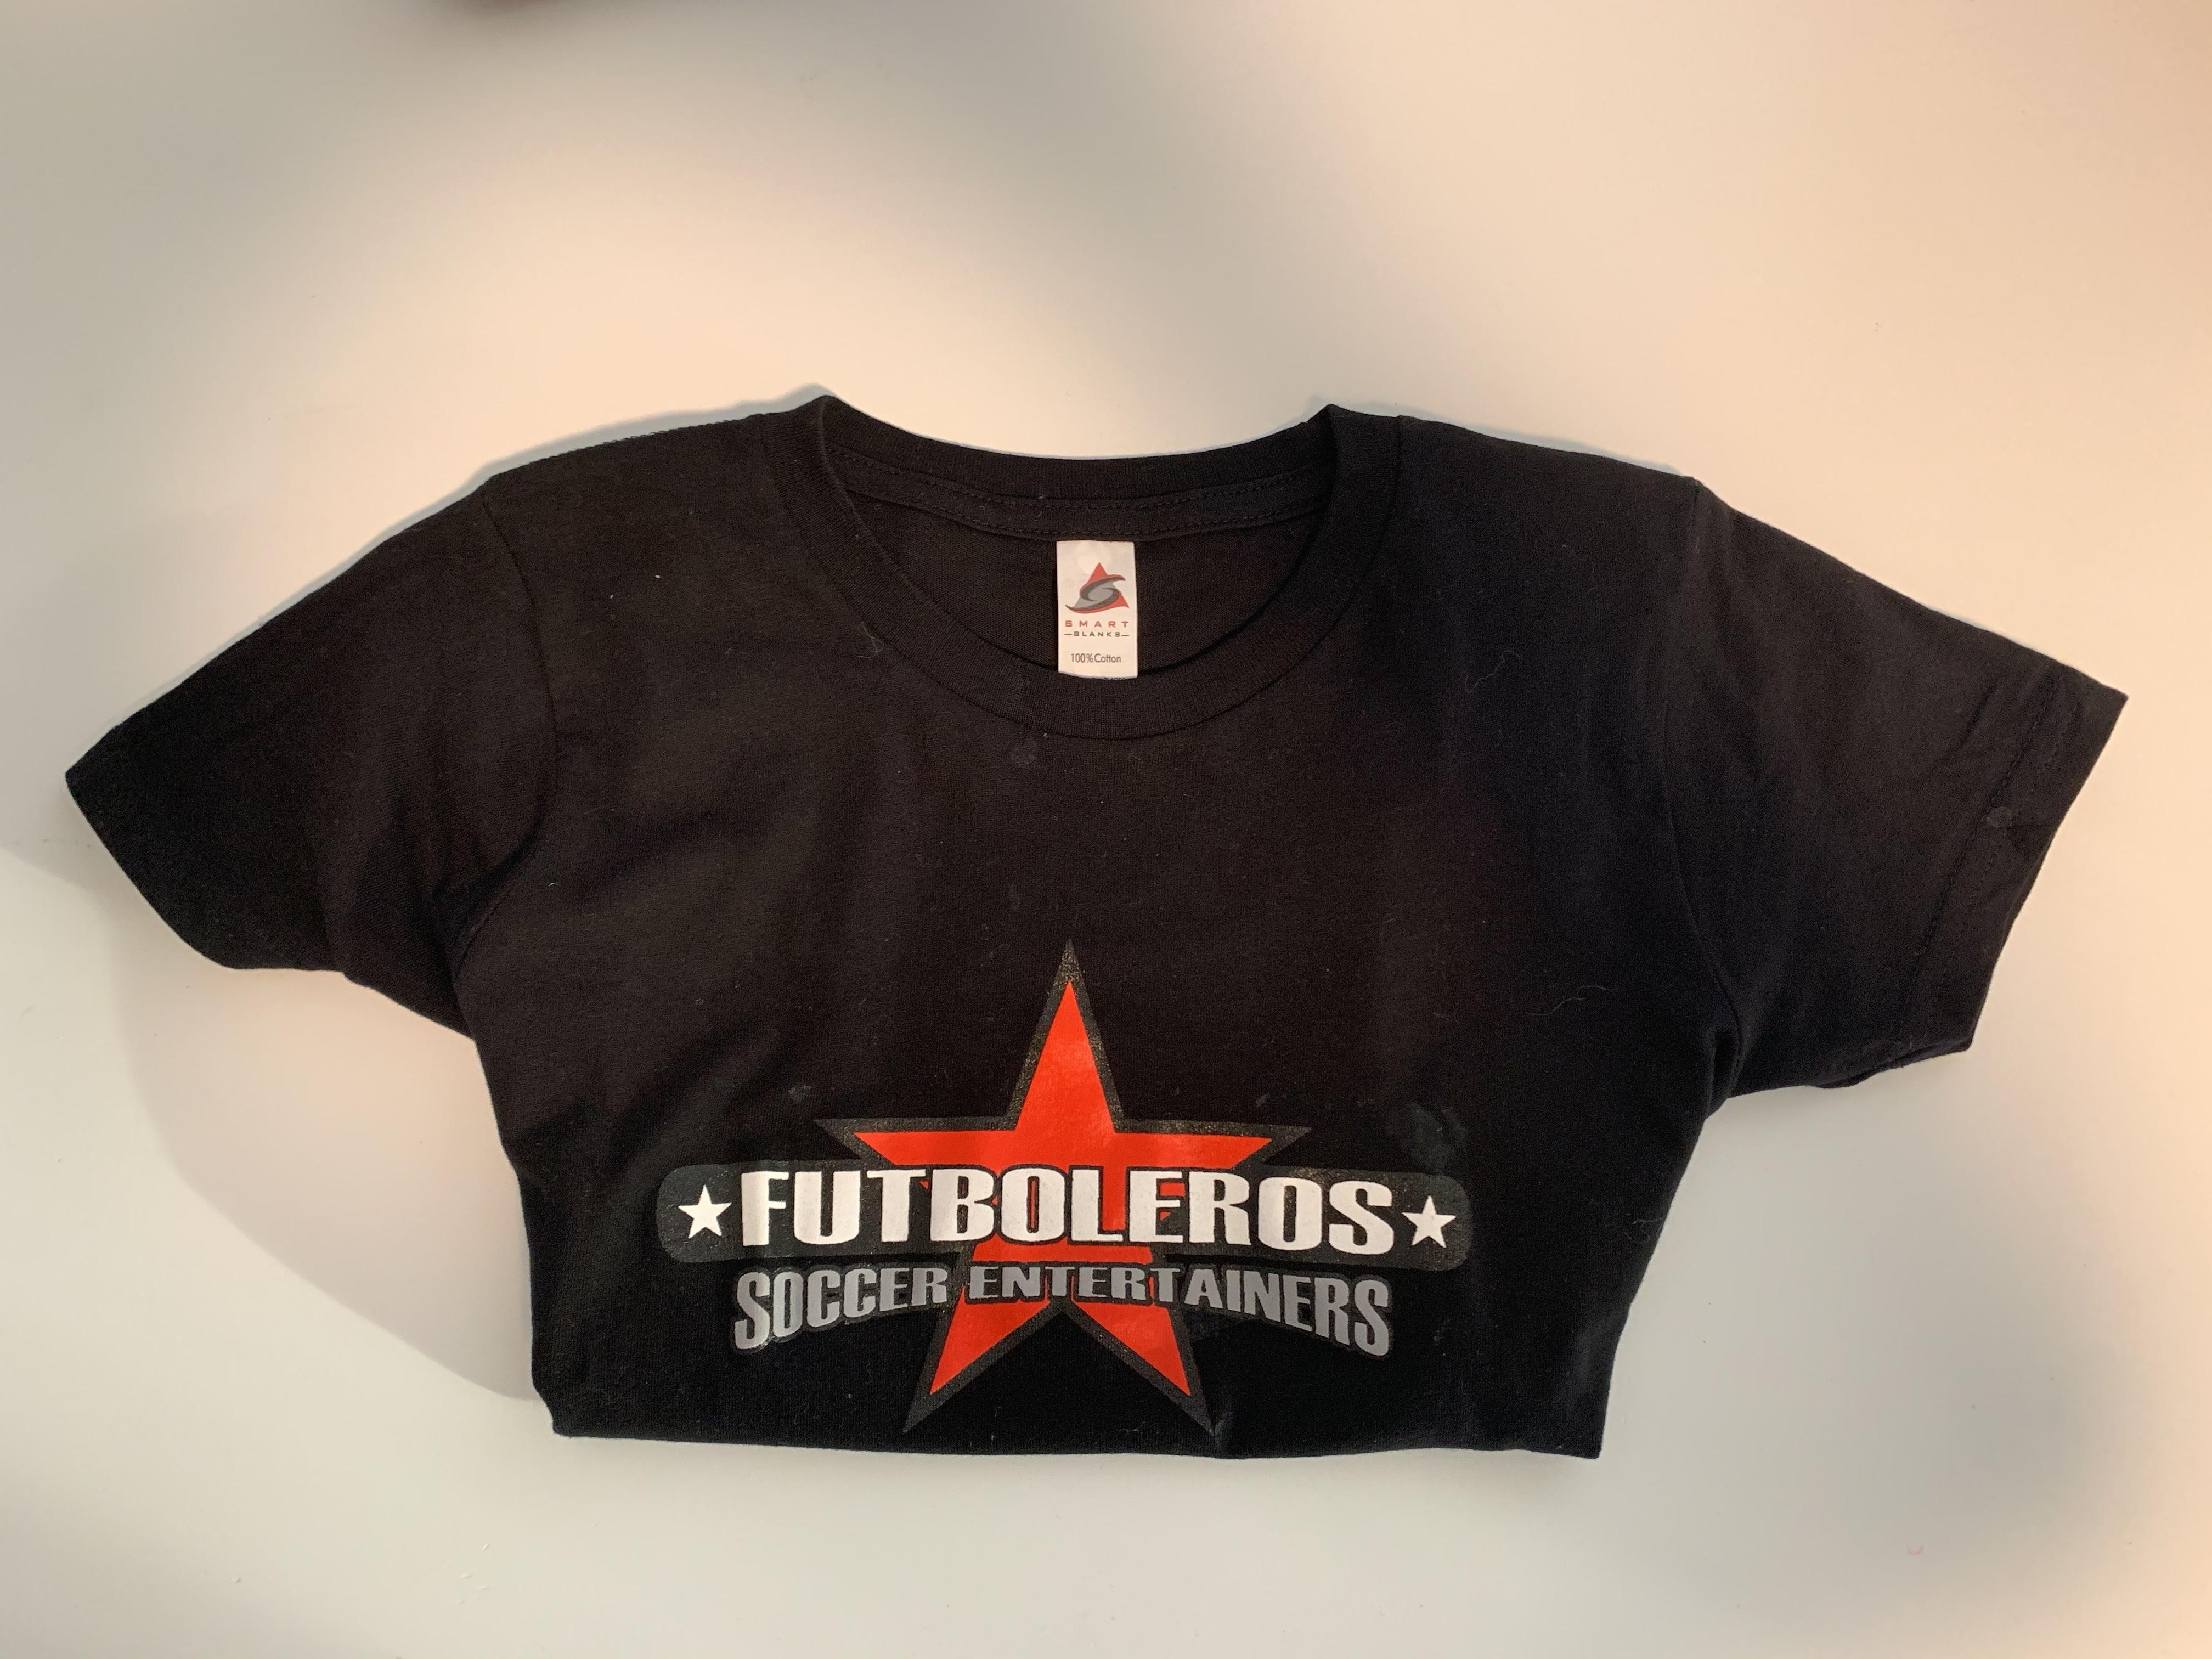 Futboleros Official T-Shirt 0013